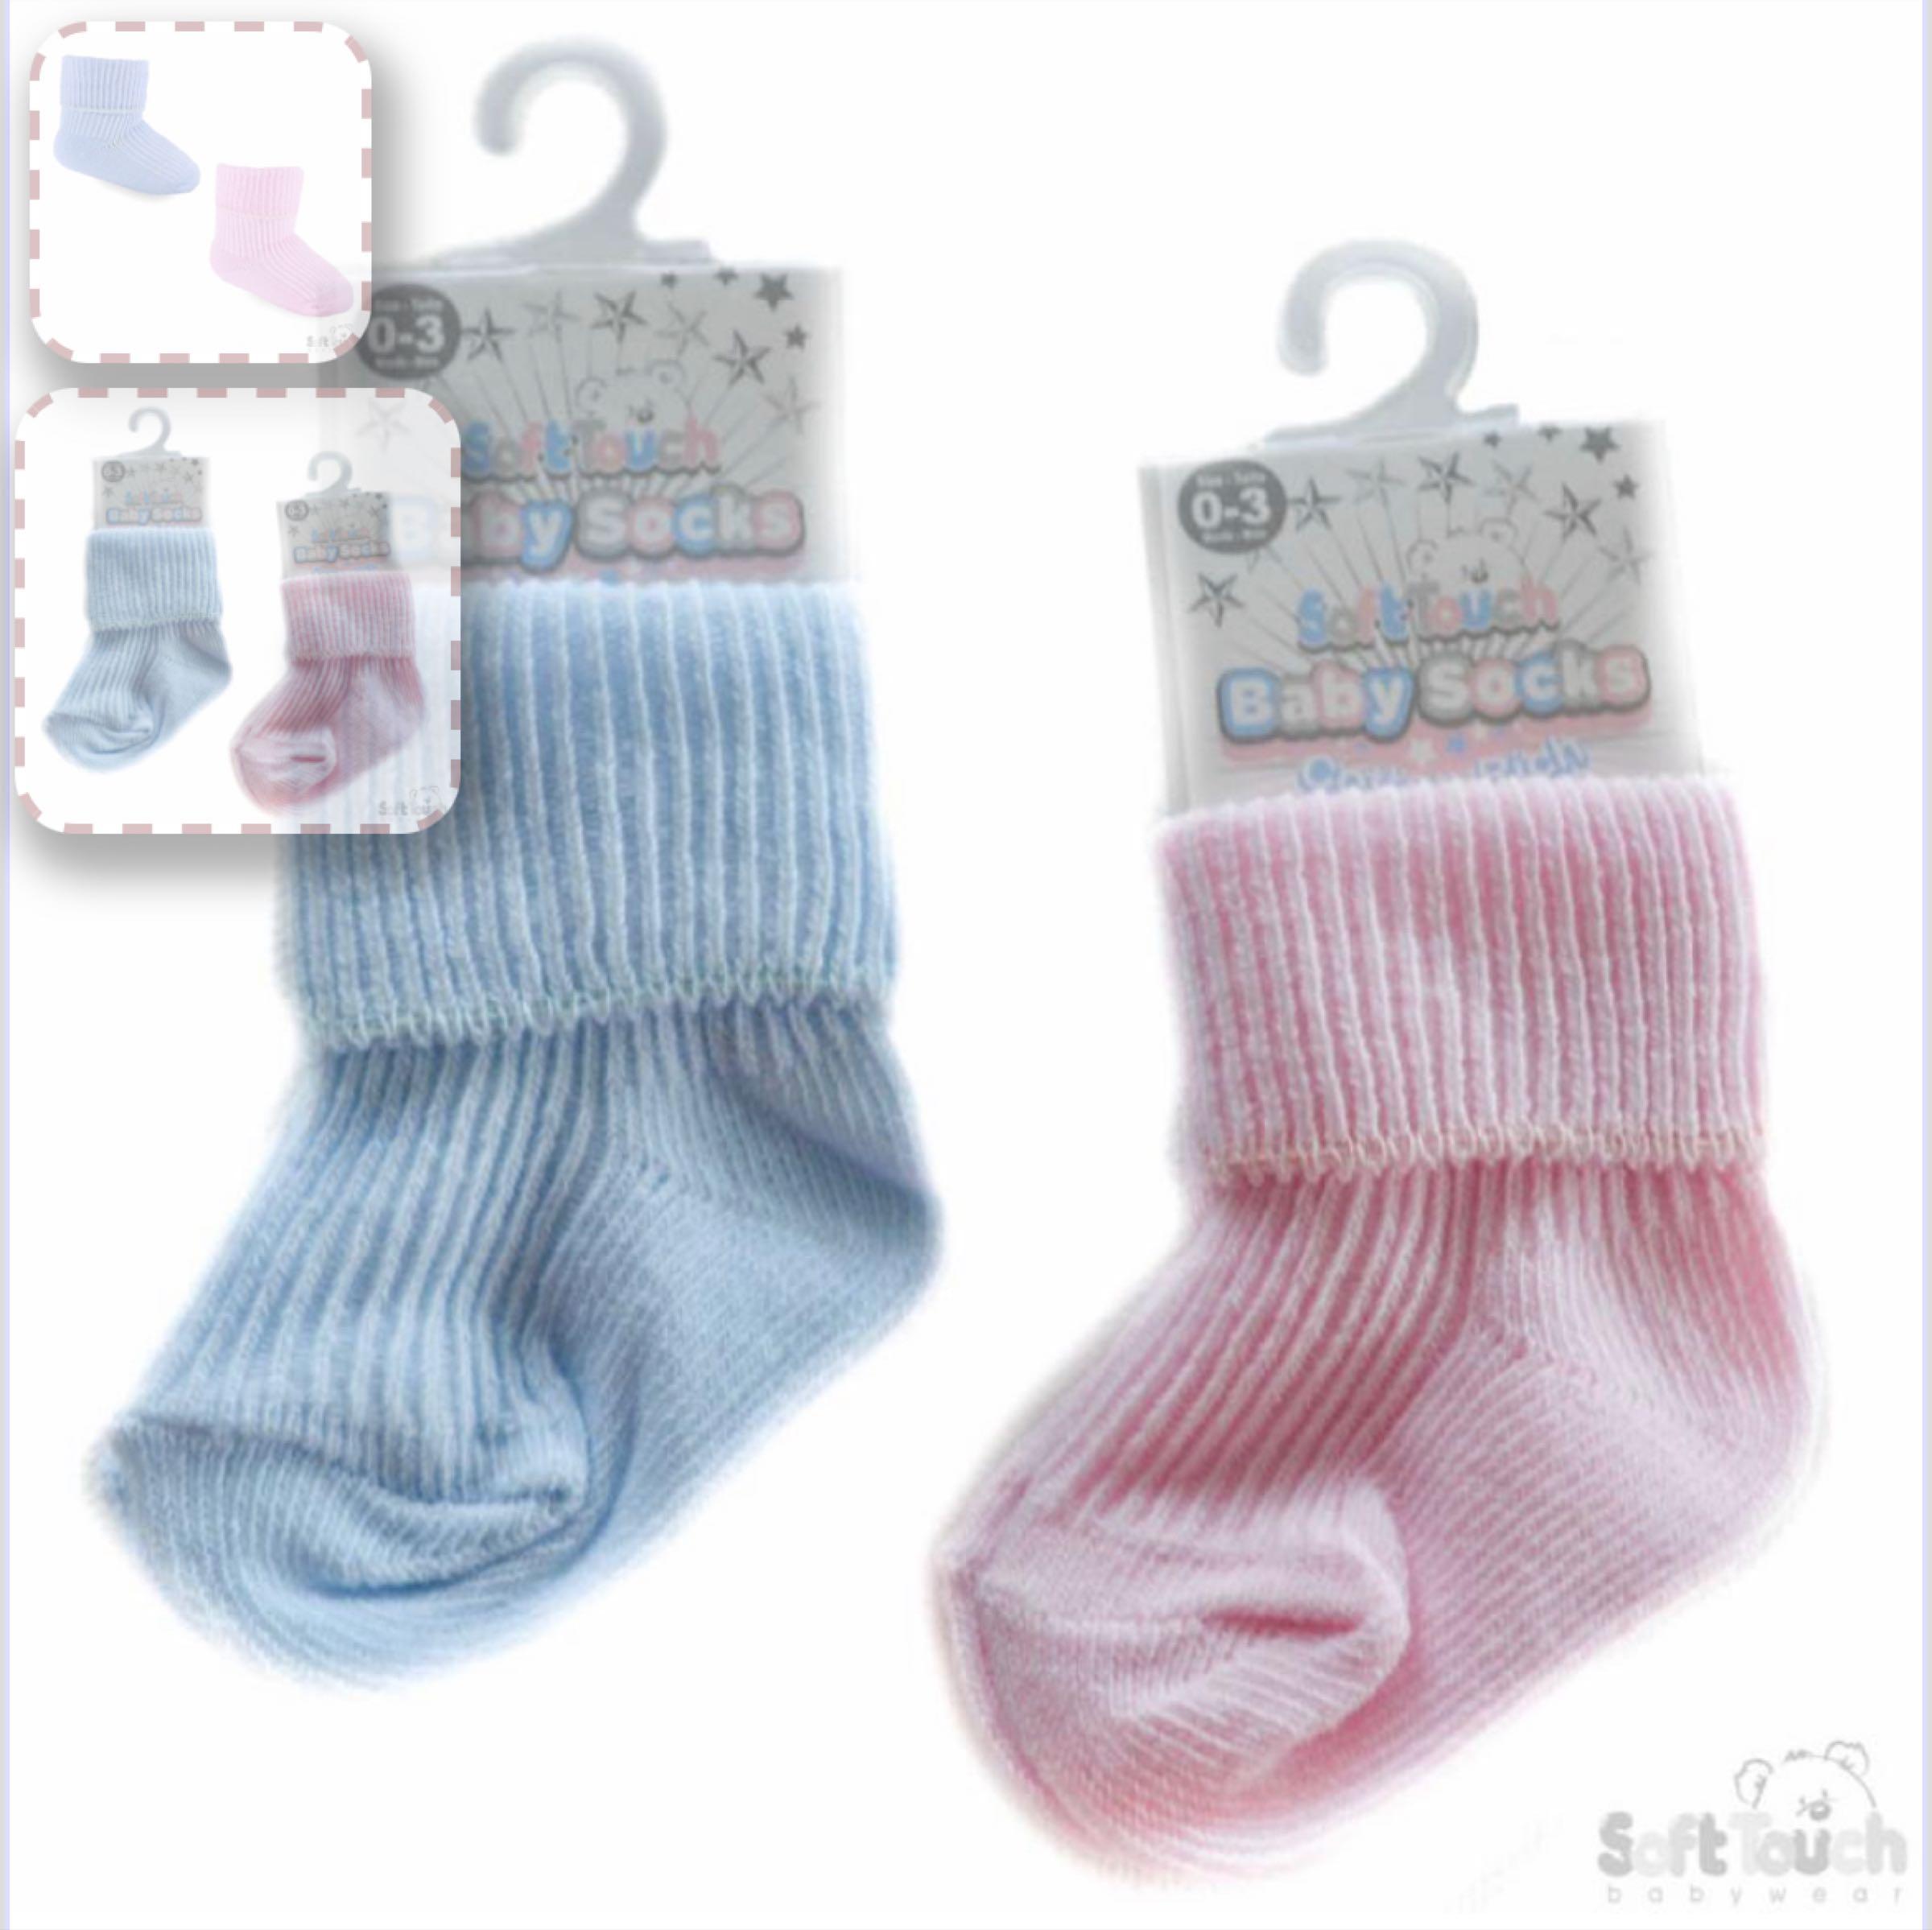 0-3 months Socks